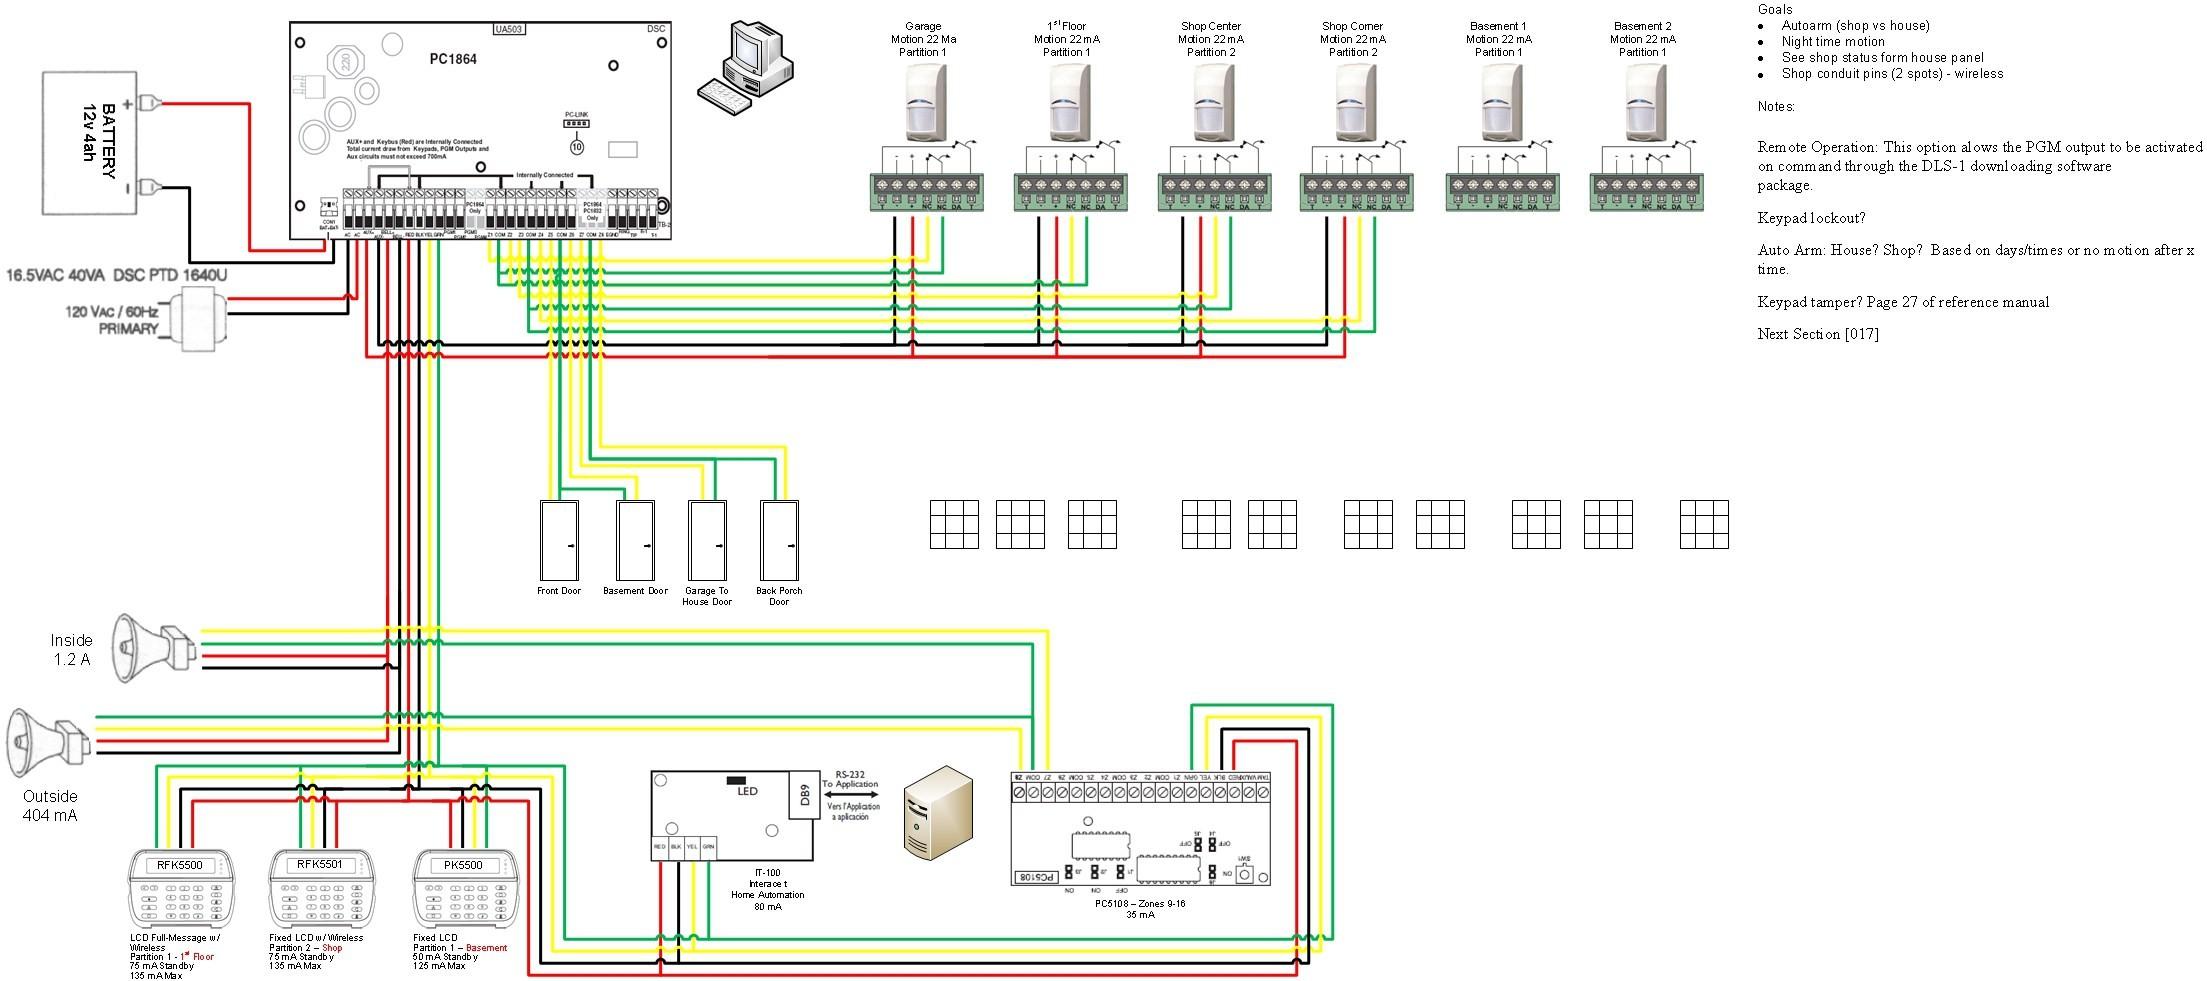 Bulldog Car Alarm Wiring Diagram Co Car Alarm Wiring Diagram Get Free Image About Wiring Diagram Of Bulldog Car Alarm Wiring Diagram